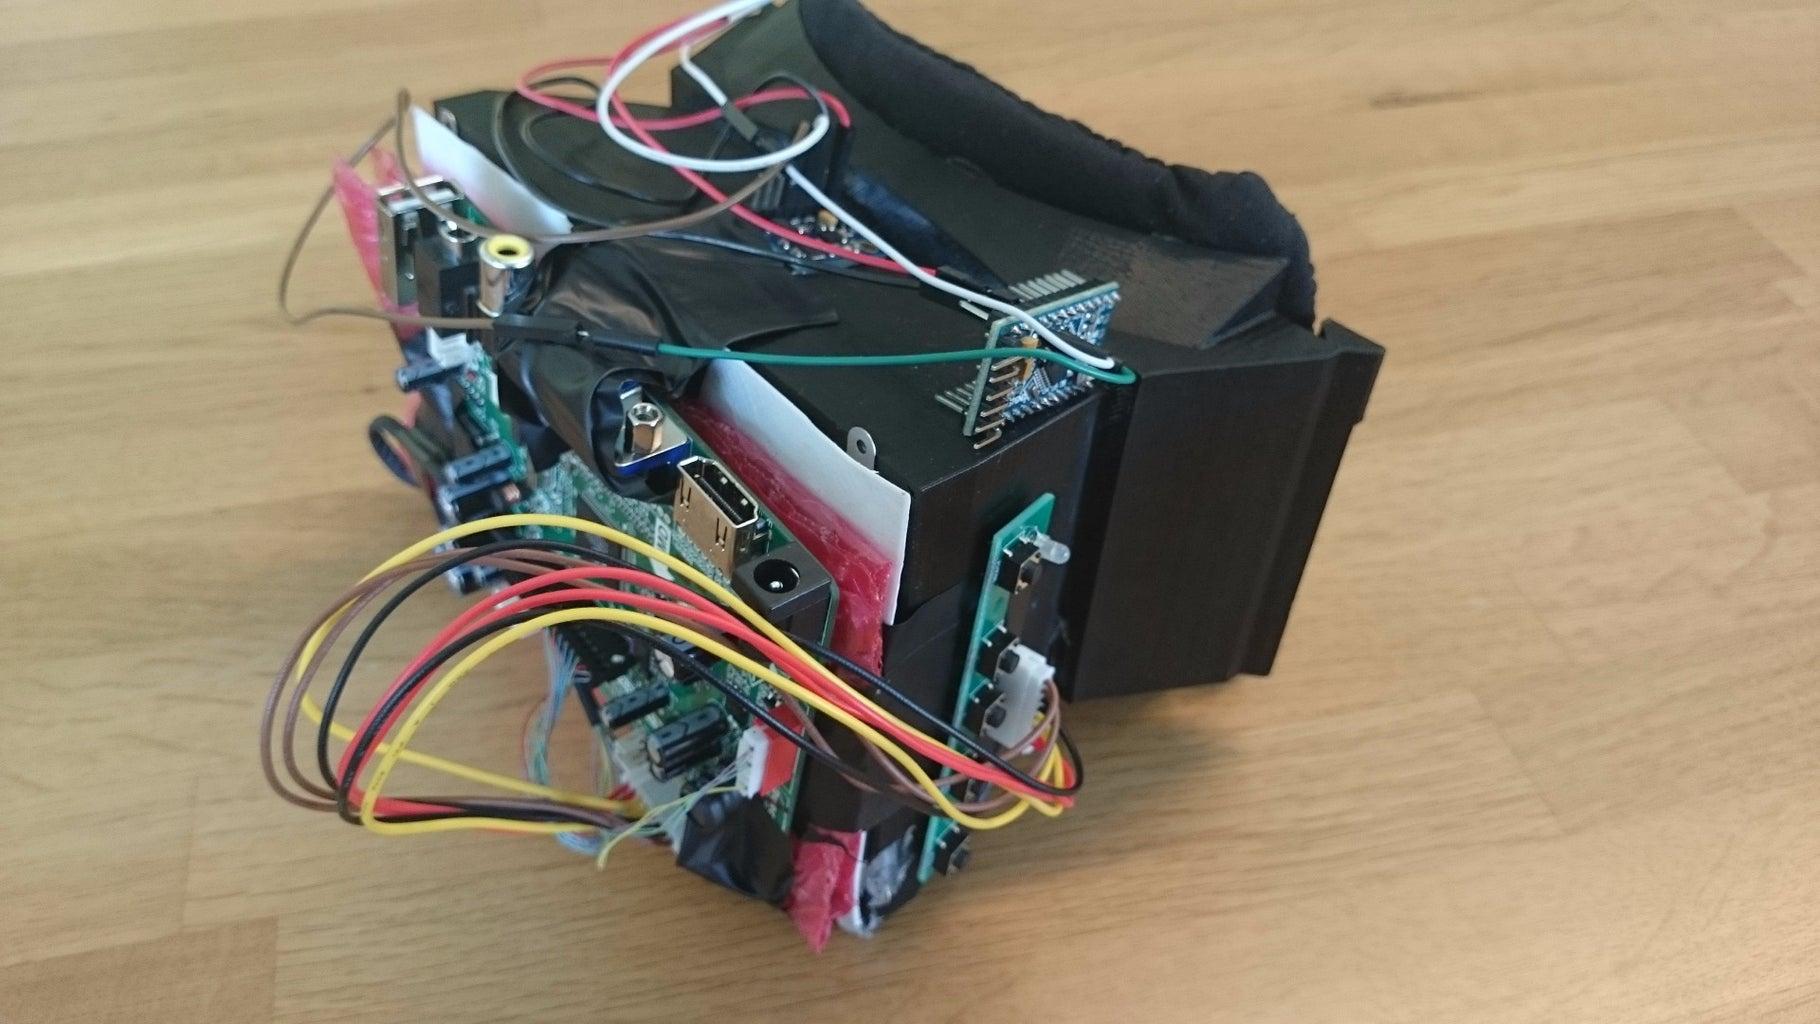 Hardware 2 : Assembly